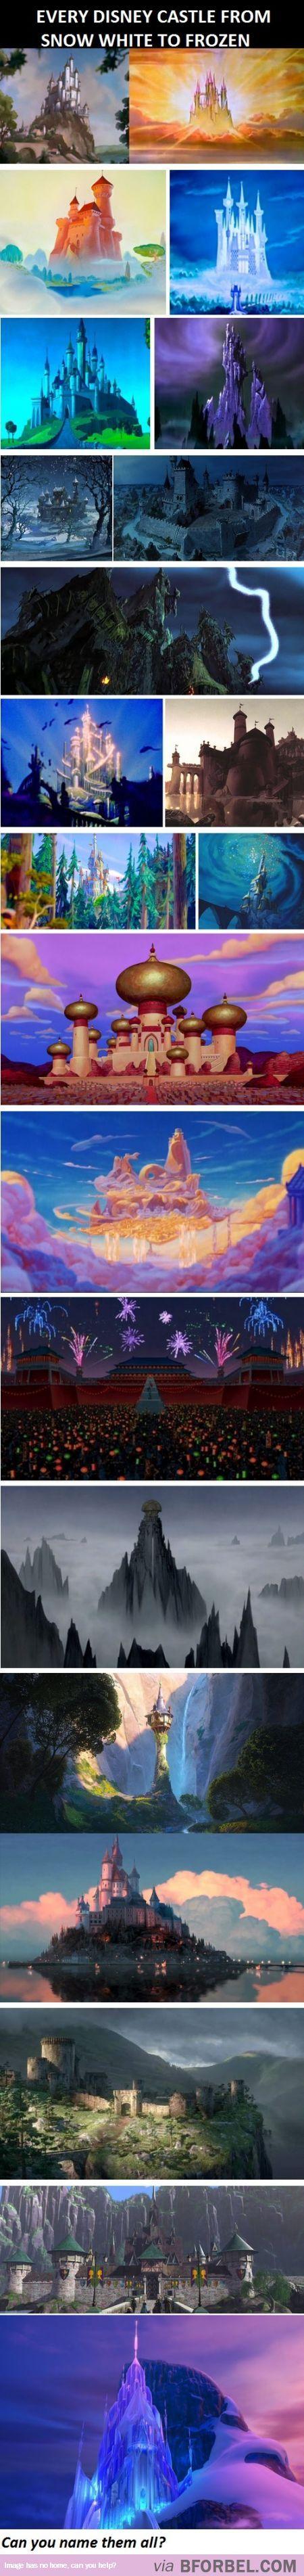 castelo das princesas disney